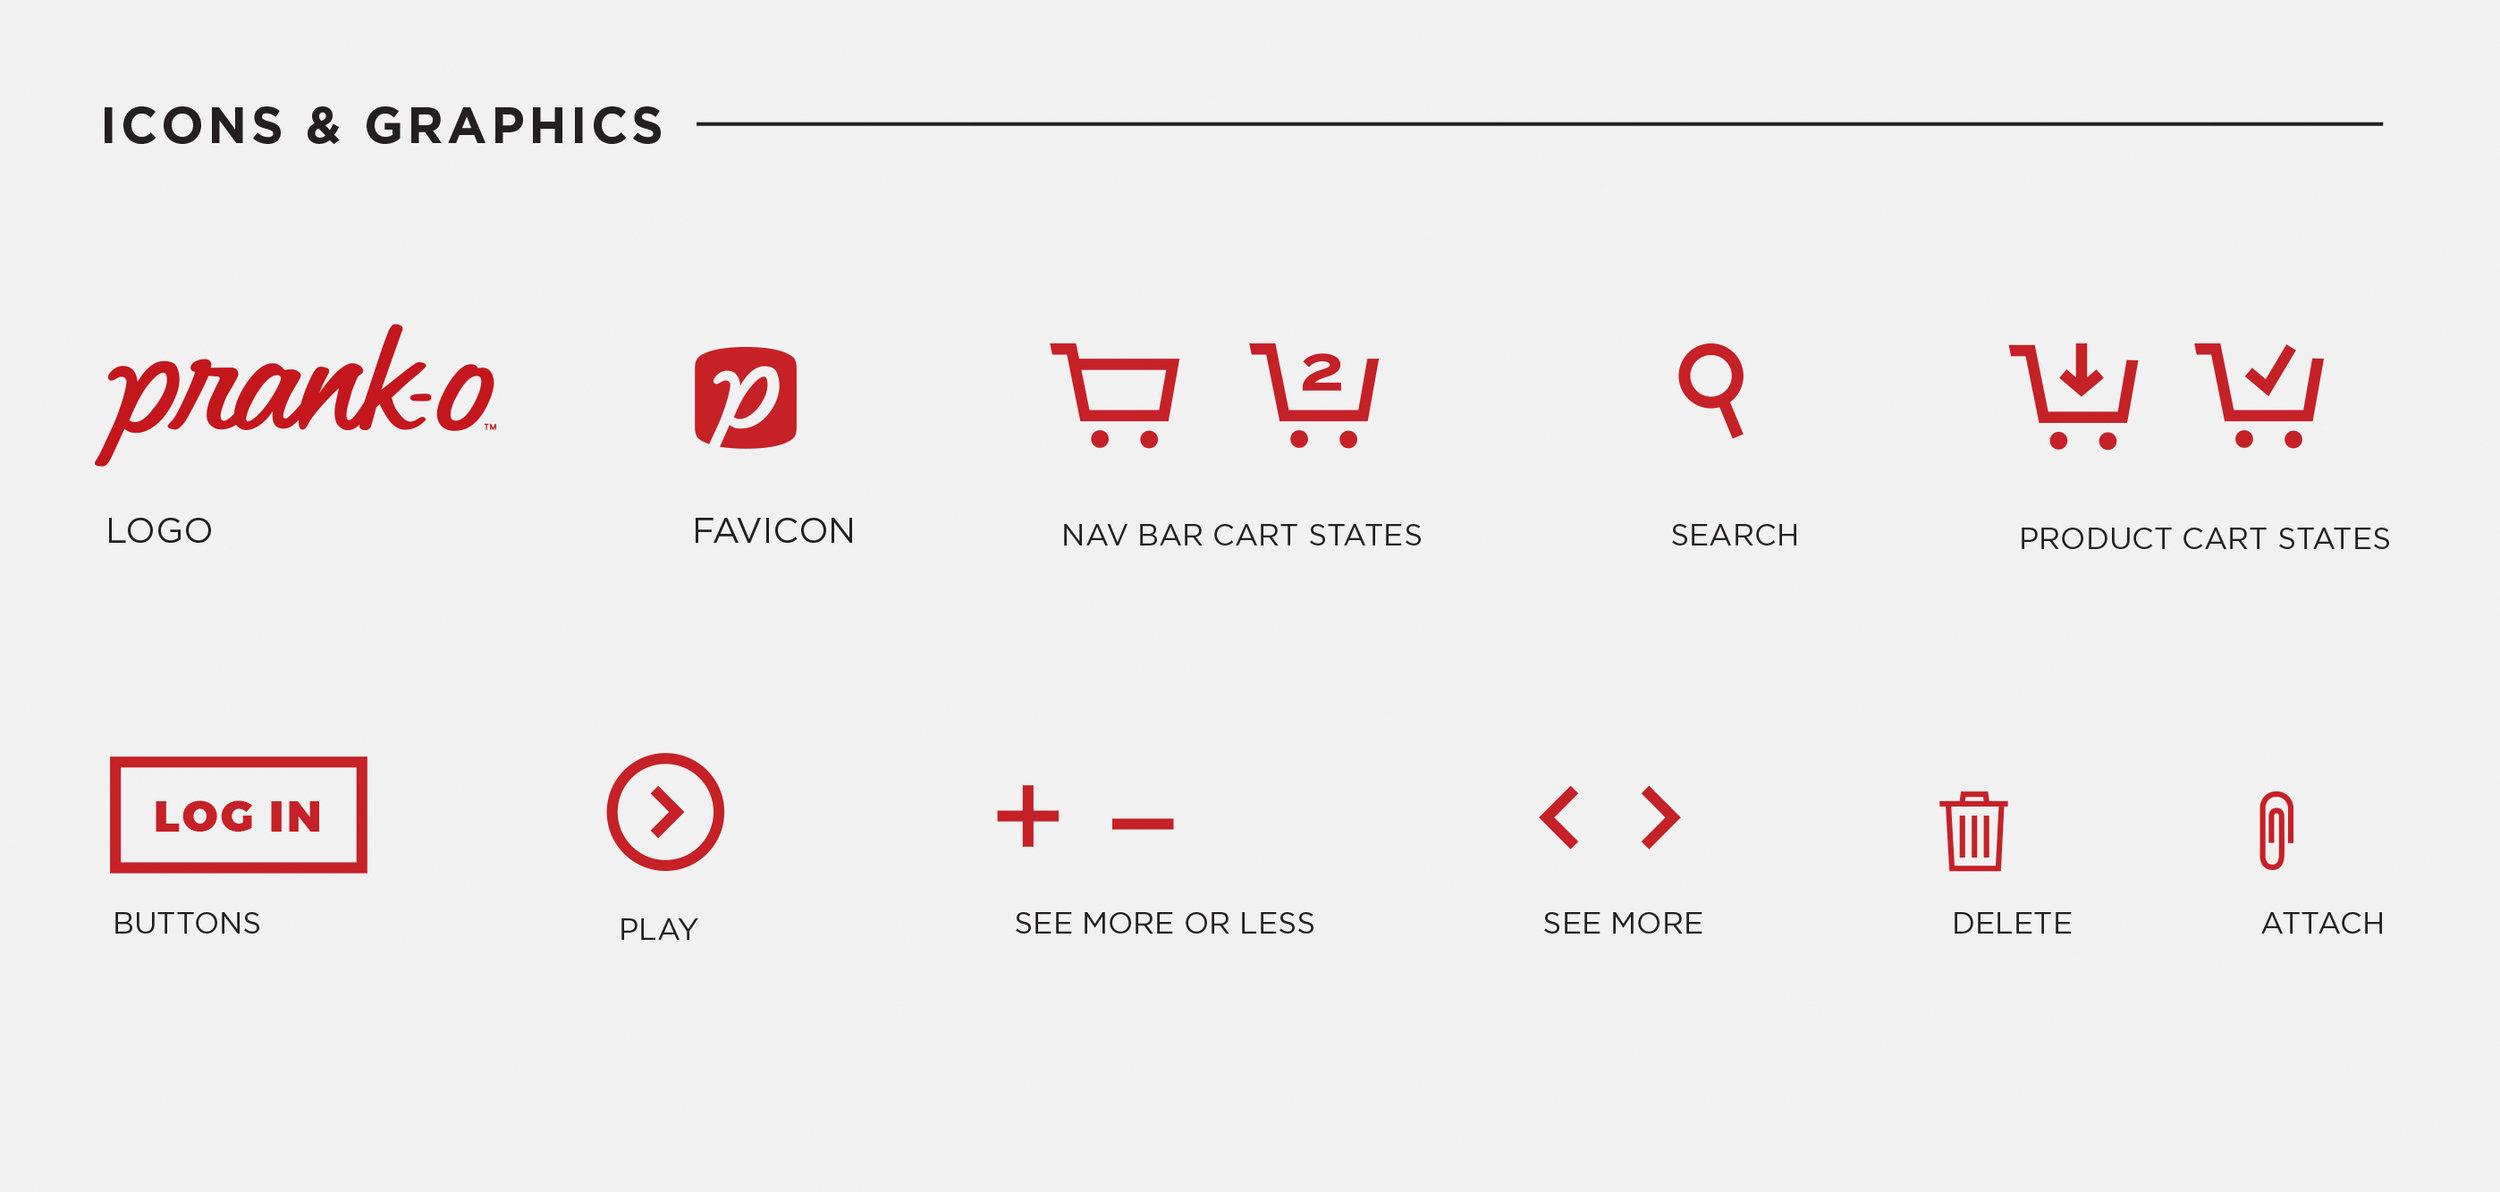 7.IconsGraphics.jpg